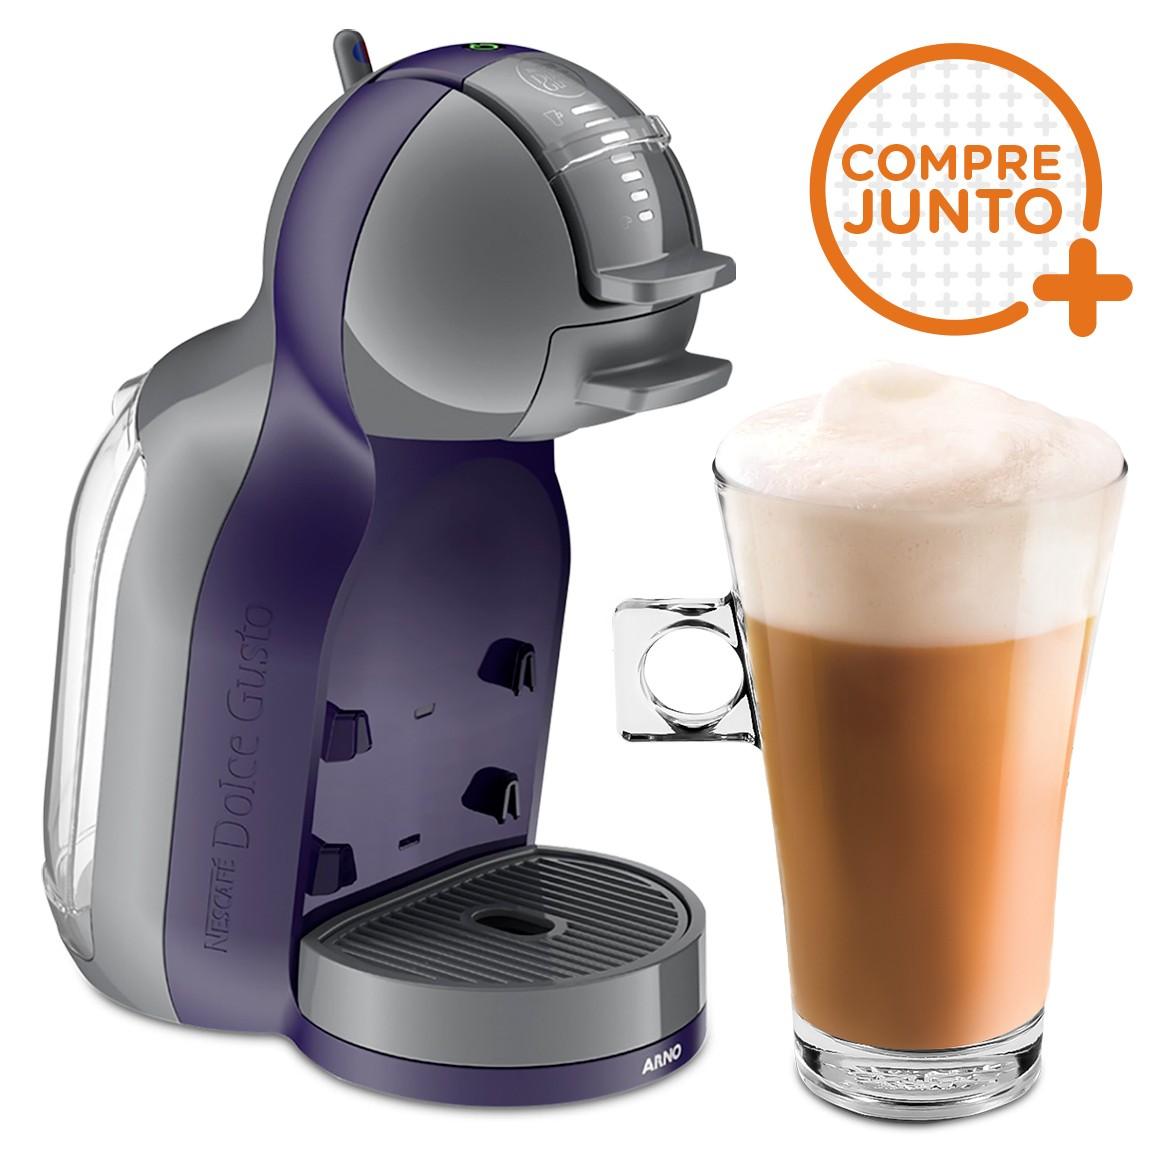 Cafeteira Expresso Dolce Gusto Mini Me Automática Roxa 220v + 1 Taça de Café Dolce Gusto 268ml